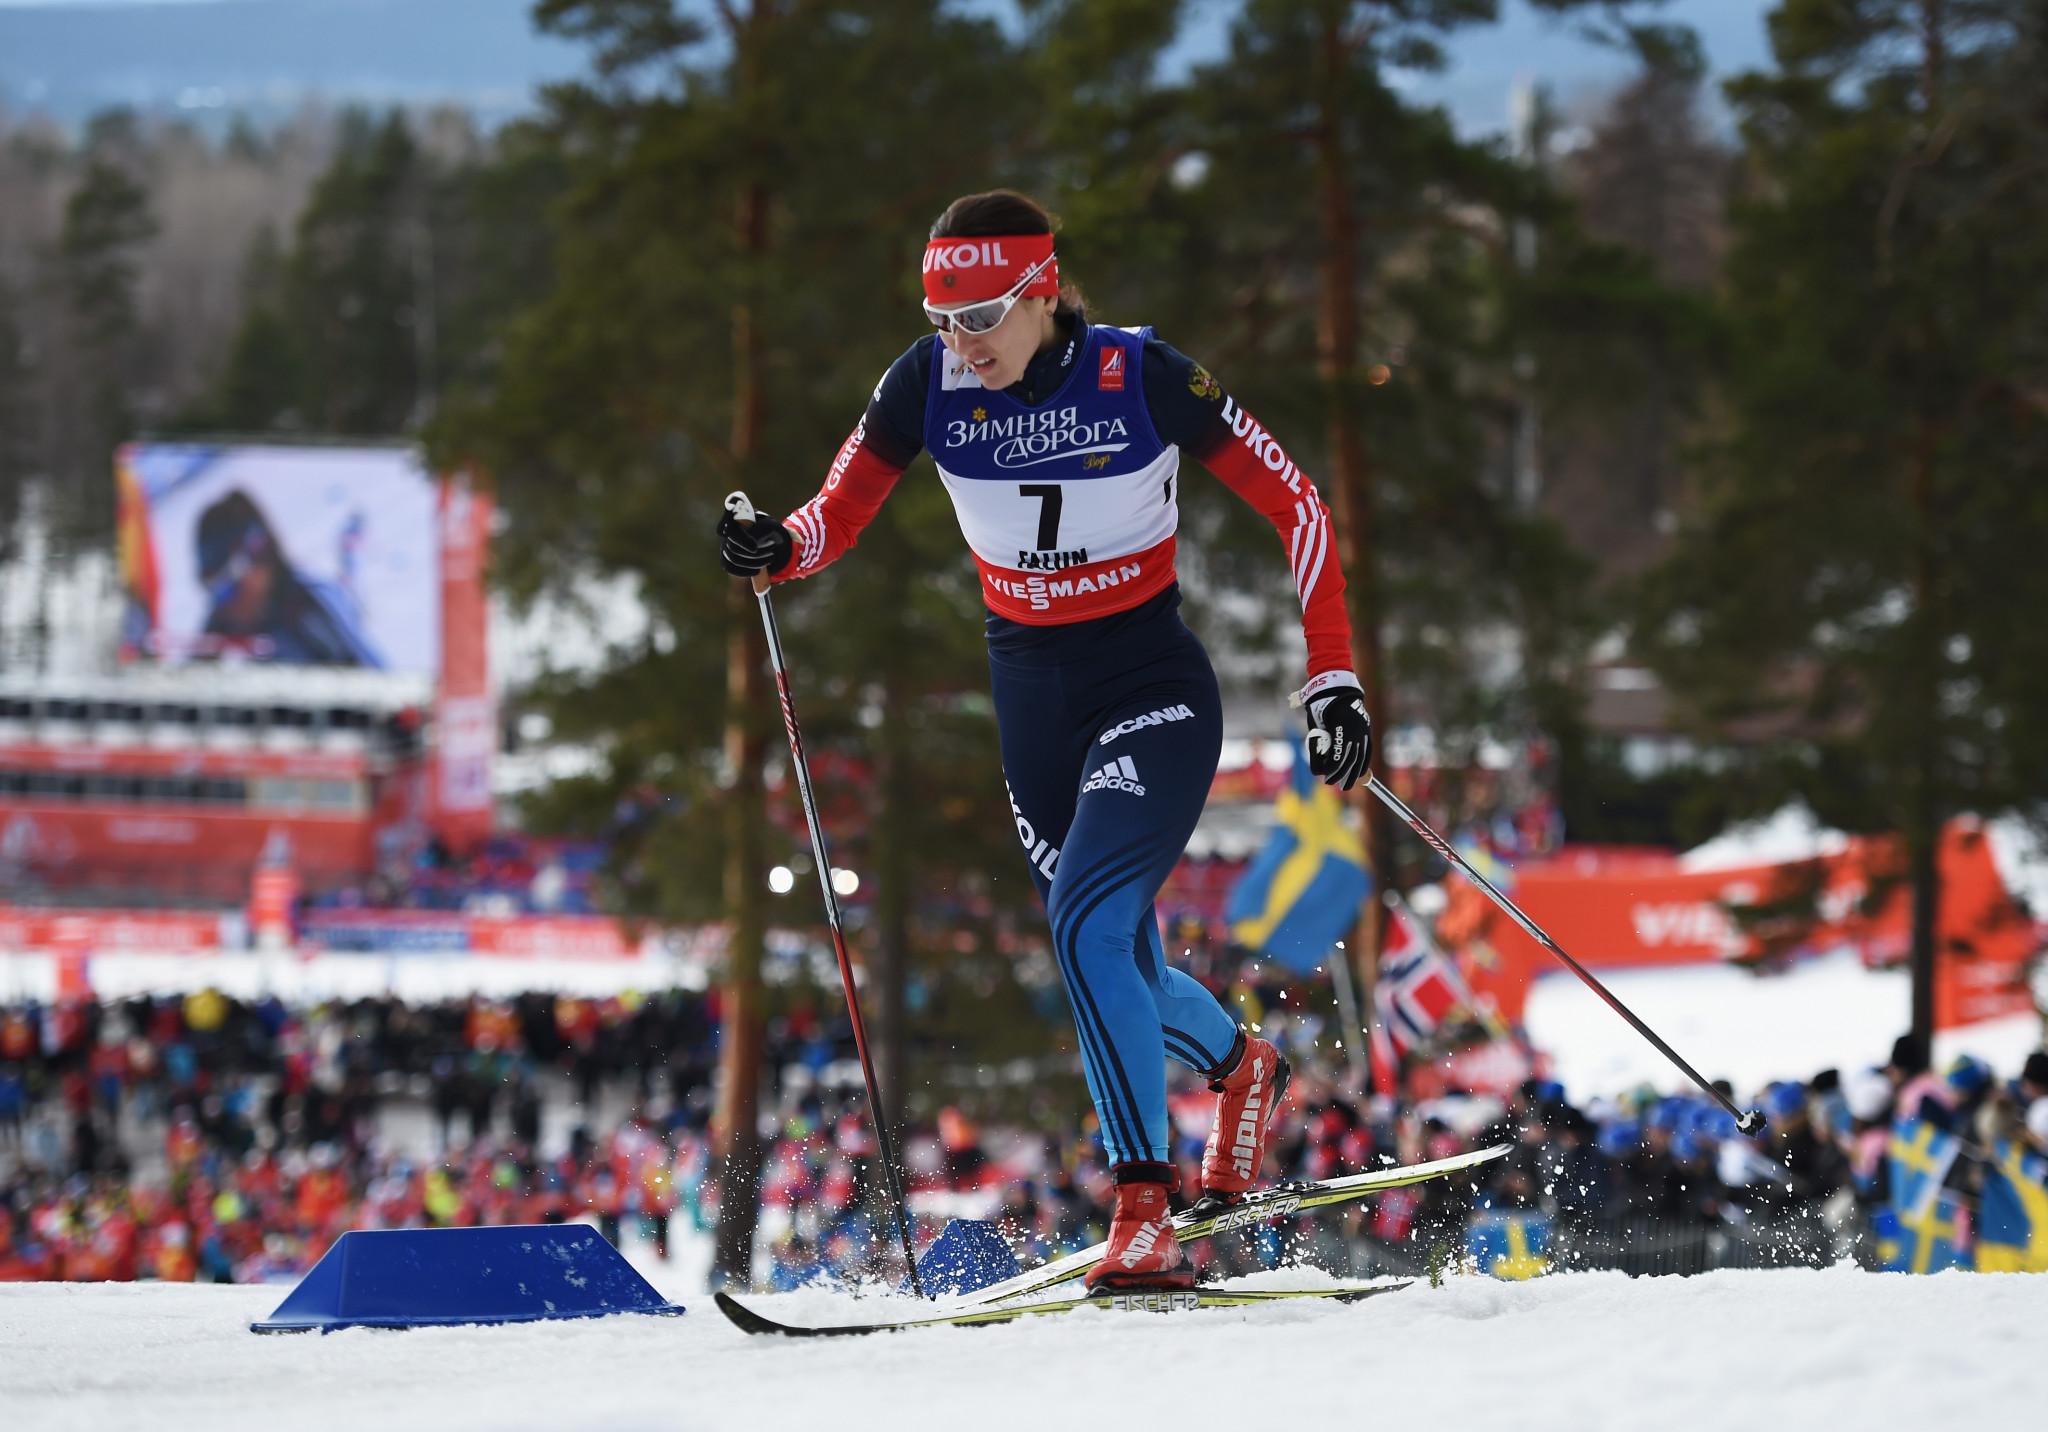 Sprinter Anastasia Dotsenko has also been sanctioned ©Getty Images